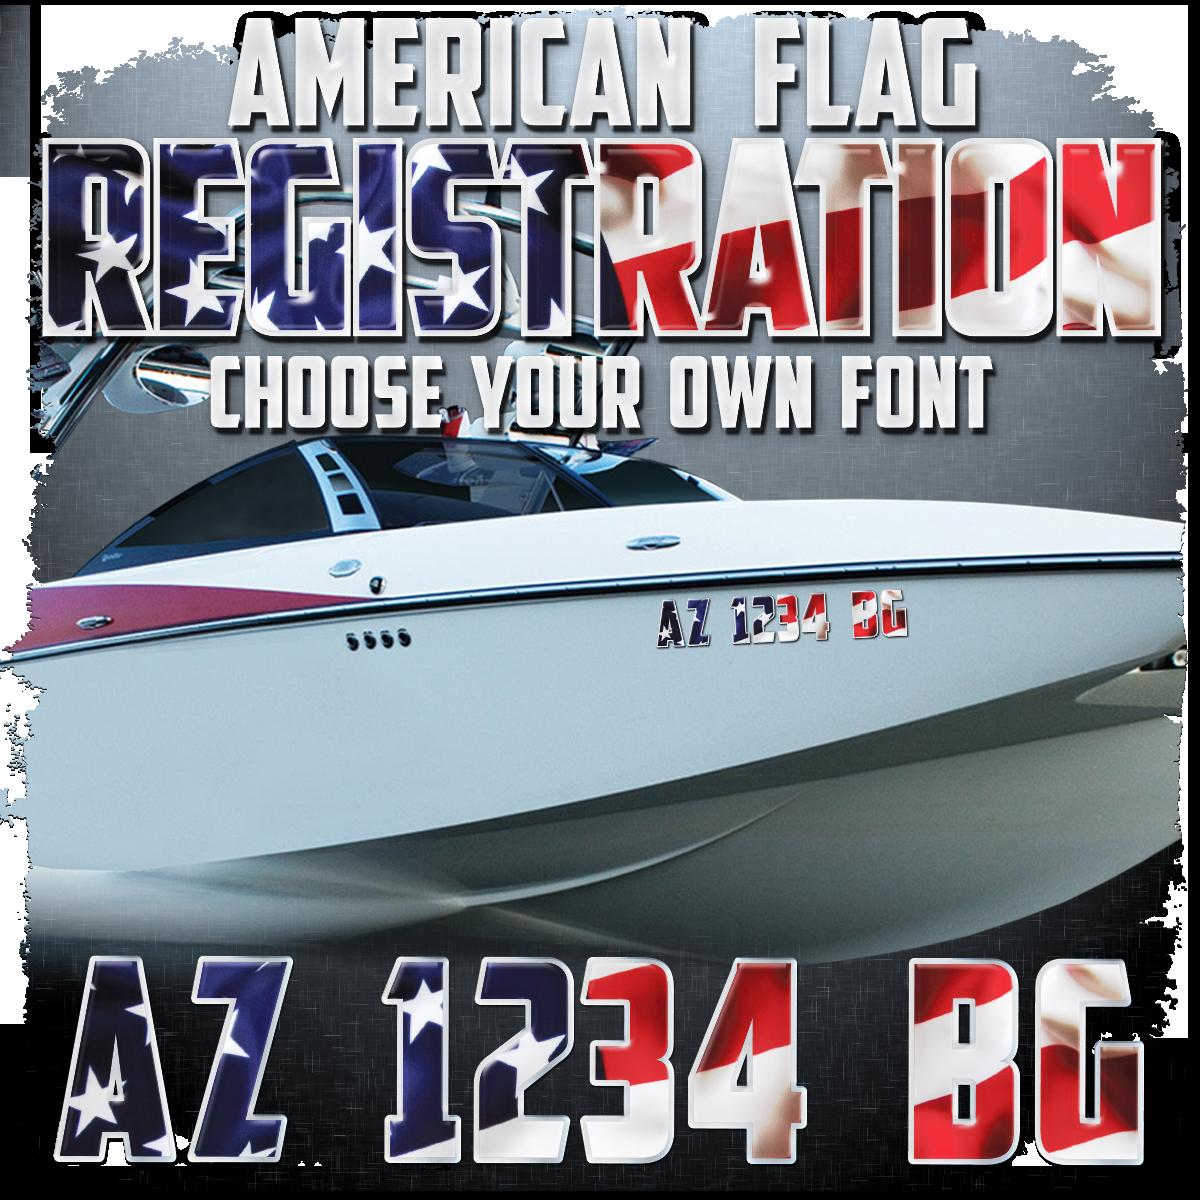 American Flag Domed Registration (2 included), Choose Your Font